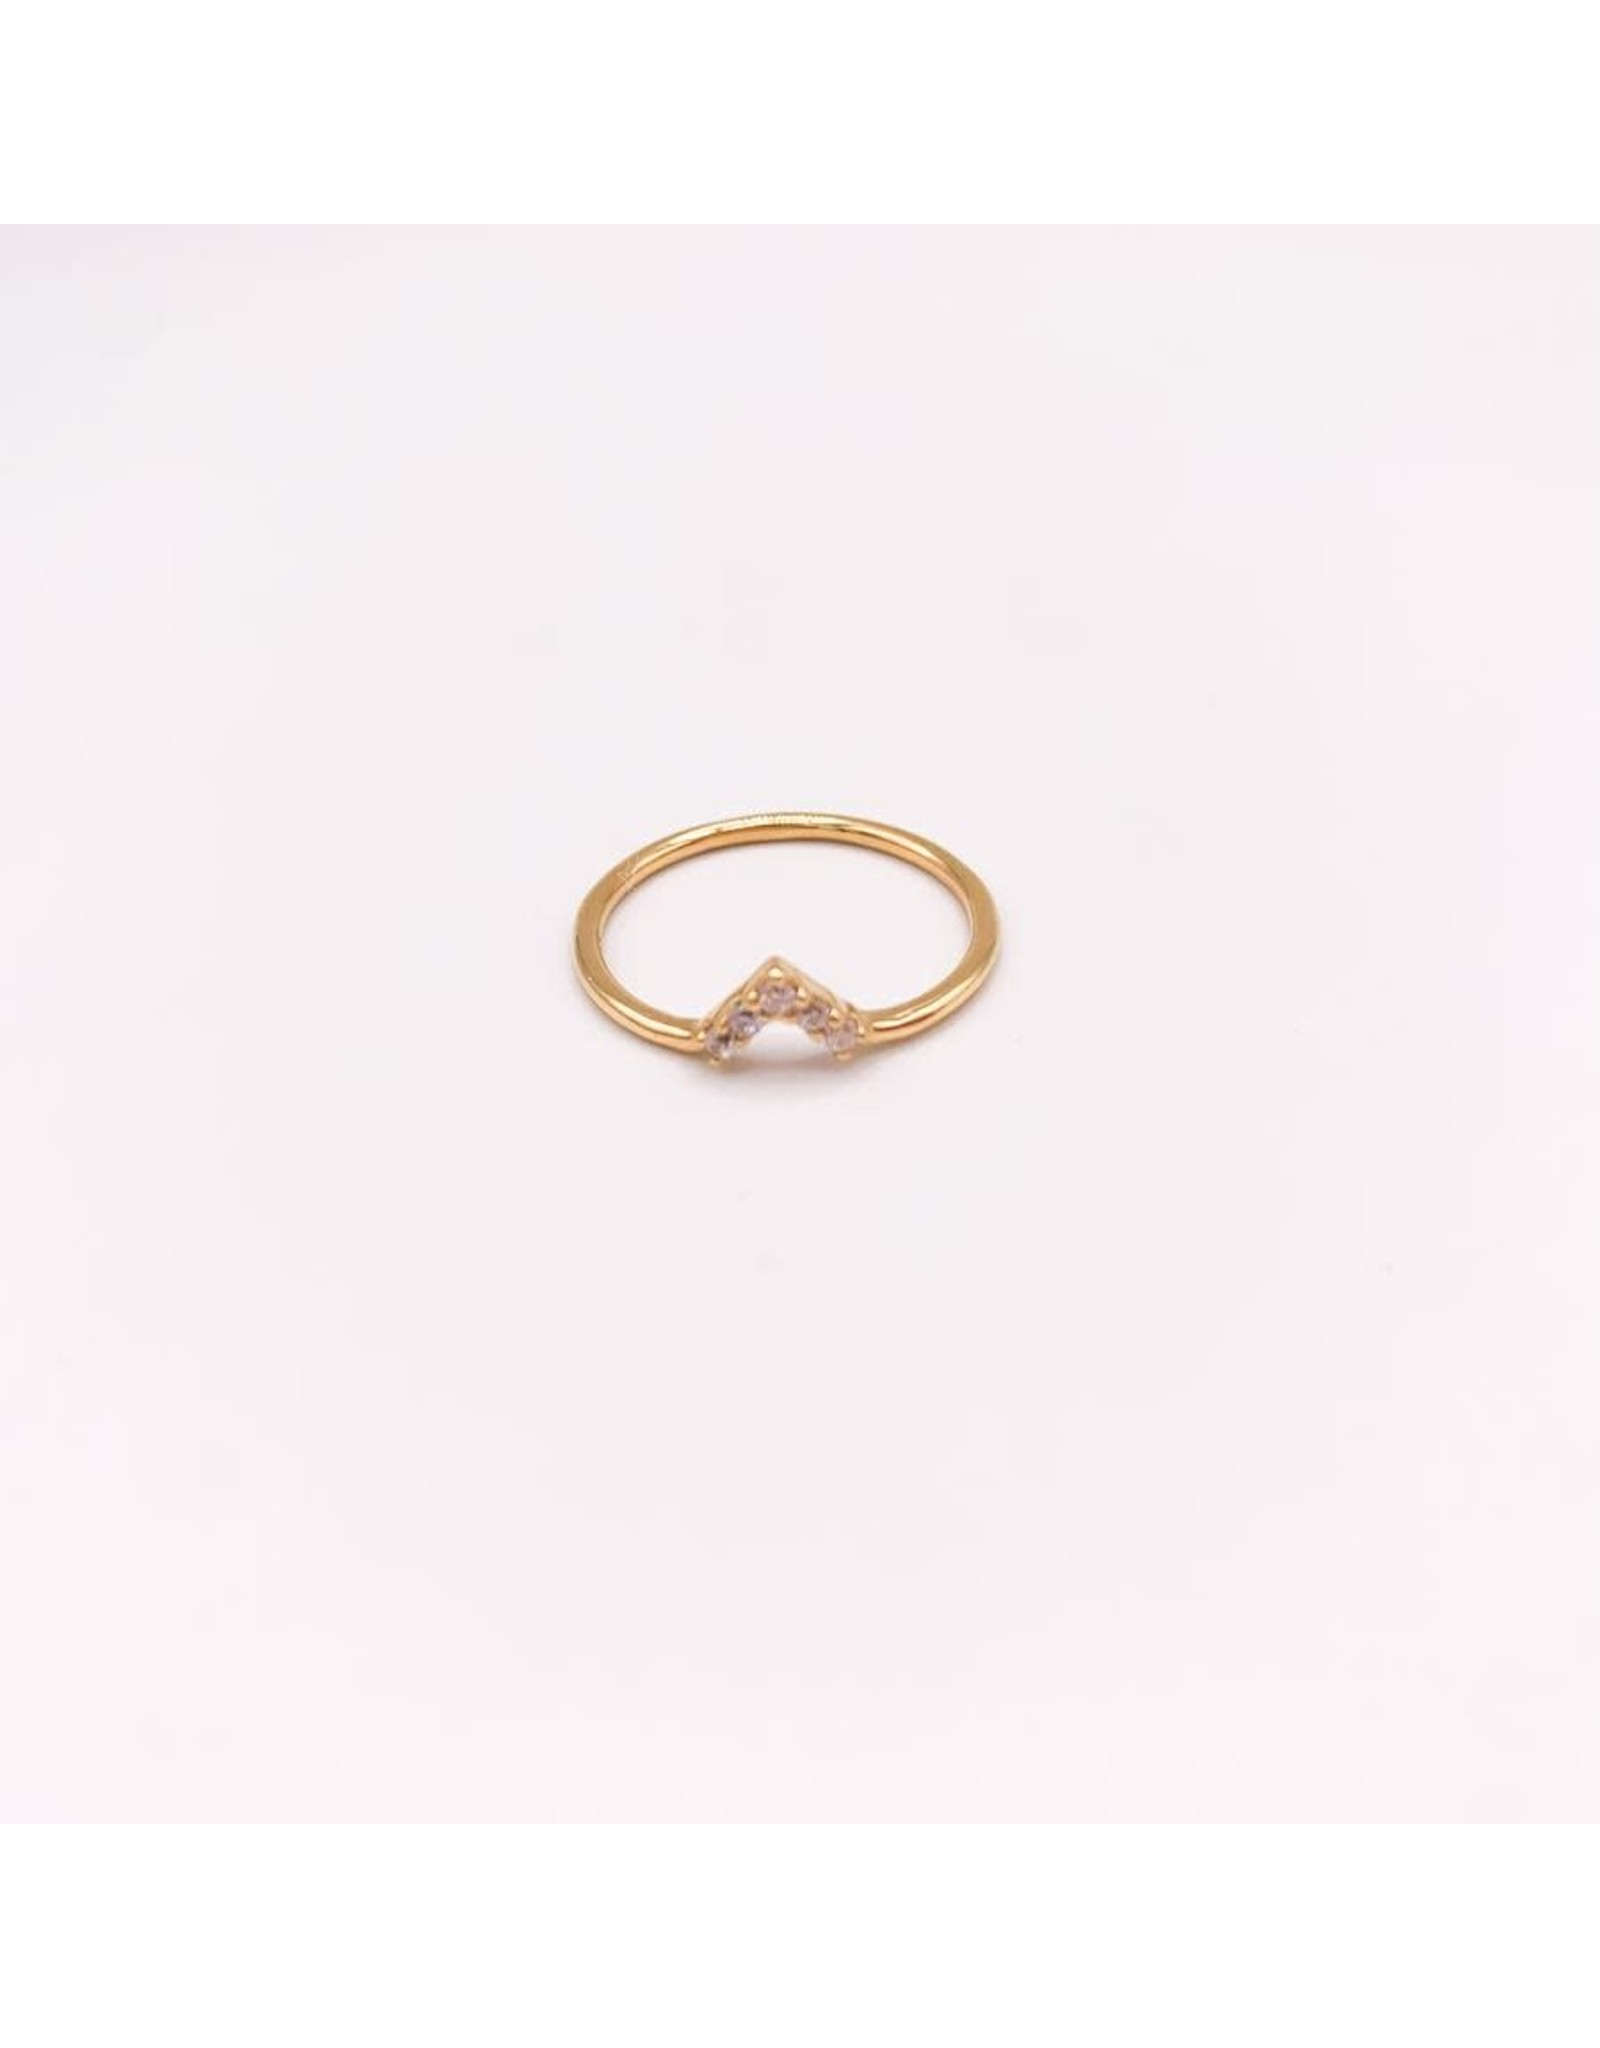 Jewelry By Amanda Gold Monde - Ring